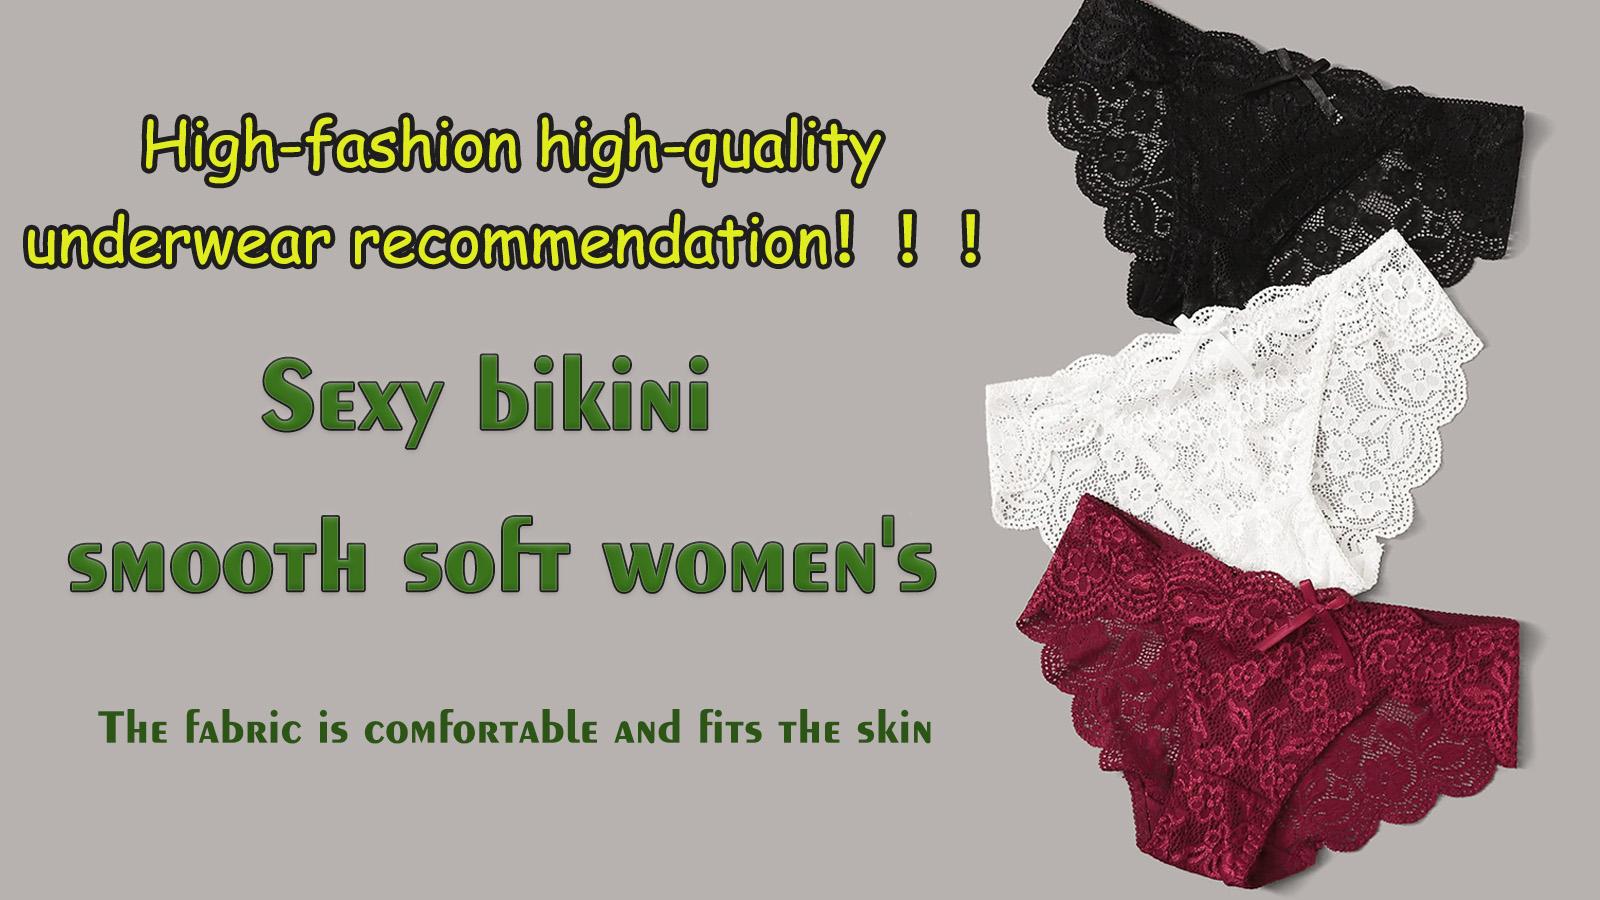 Hot Sexy Bikini Smooth Soft Colorful Lace Women panties Underwear 8933